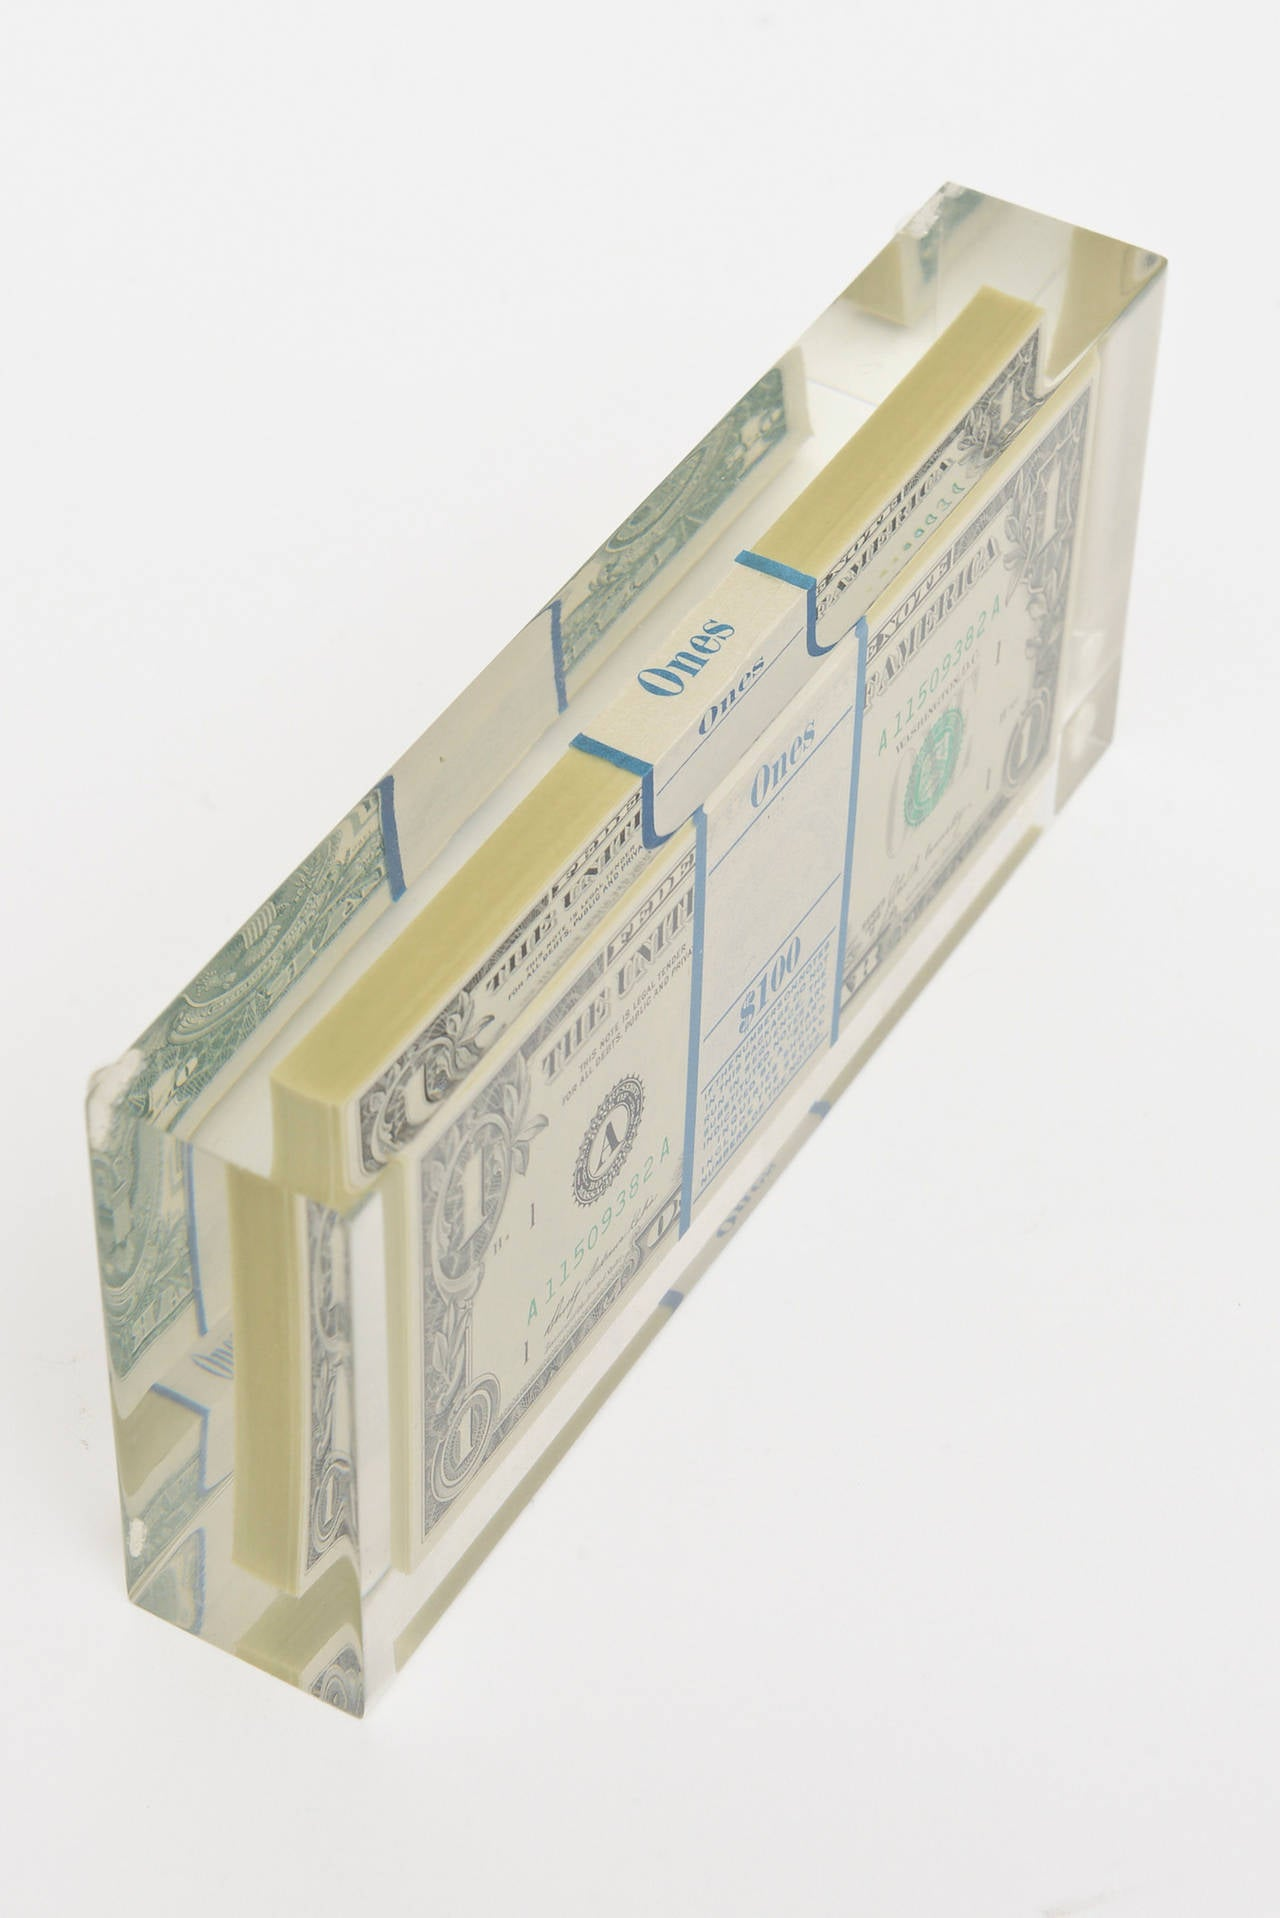 Tongue N Cheek Vintage Dollar Bill Allusion Pop Art Lucite Sculpture  For Sale 3